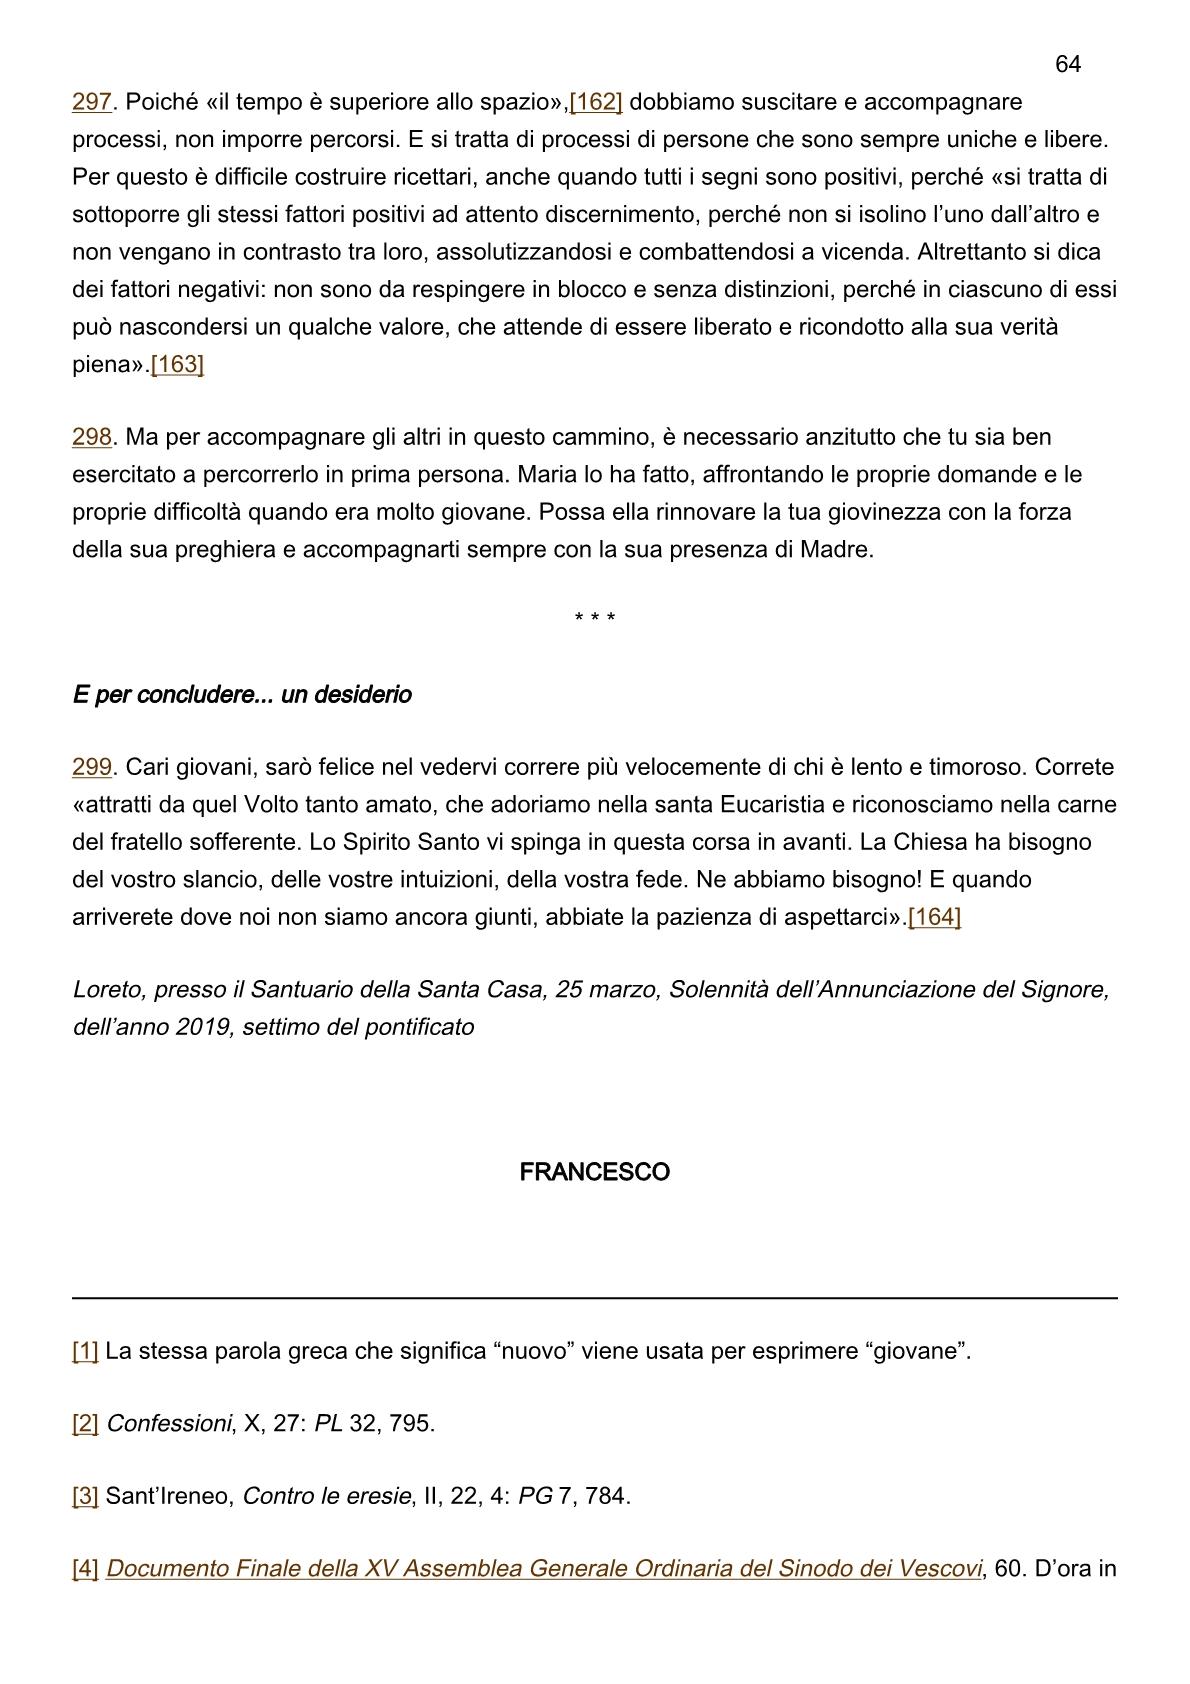 papa-francesco_esortazione-ap_20190325_christus-vivit64